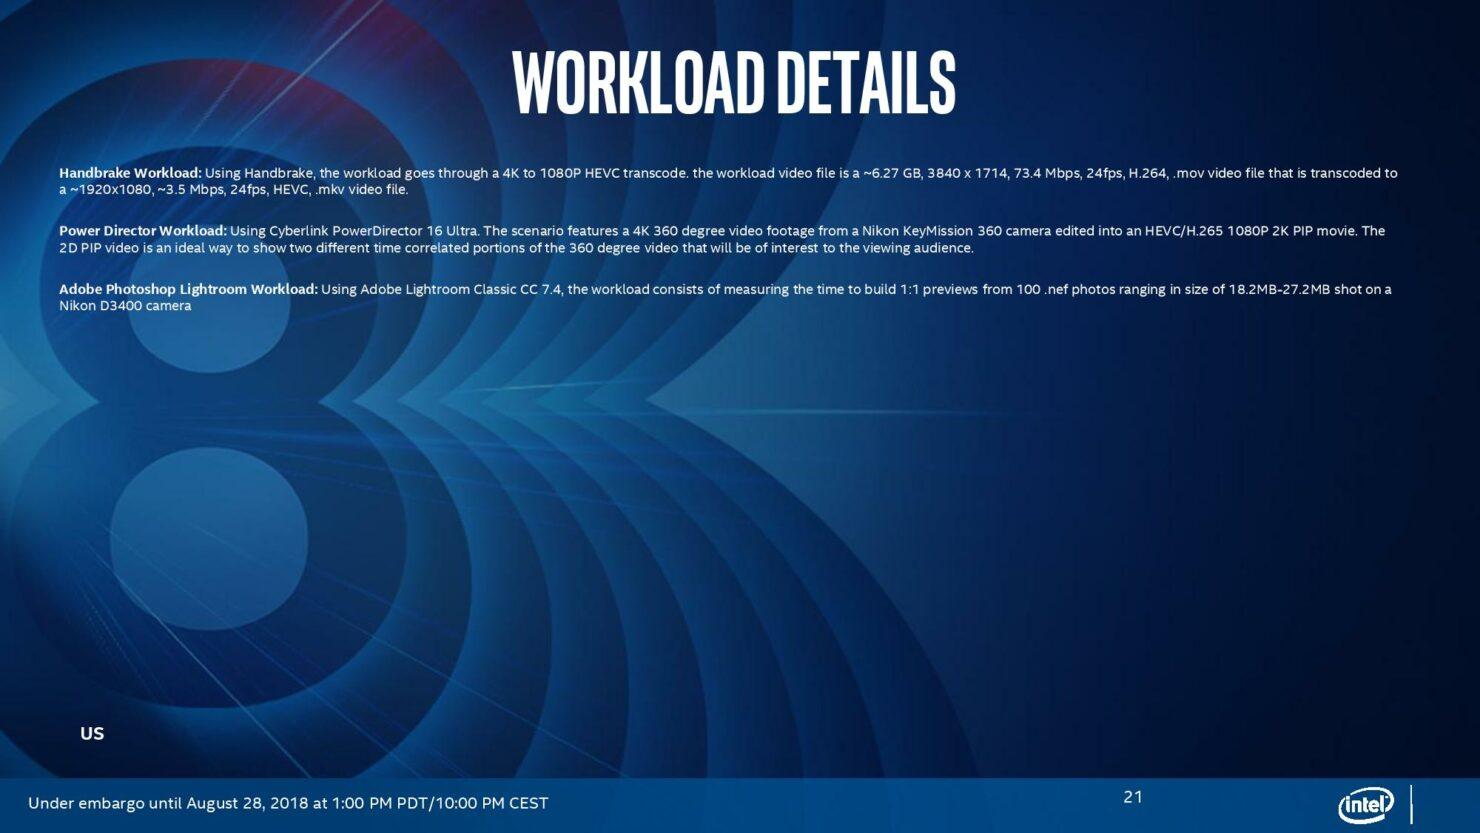 usman_pirzada_intel-whl-aml-launch-press_presentation_final_aug-24vnsn-page-021-2